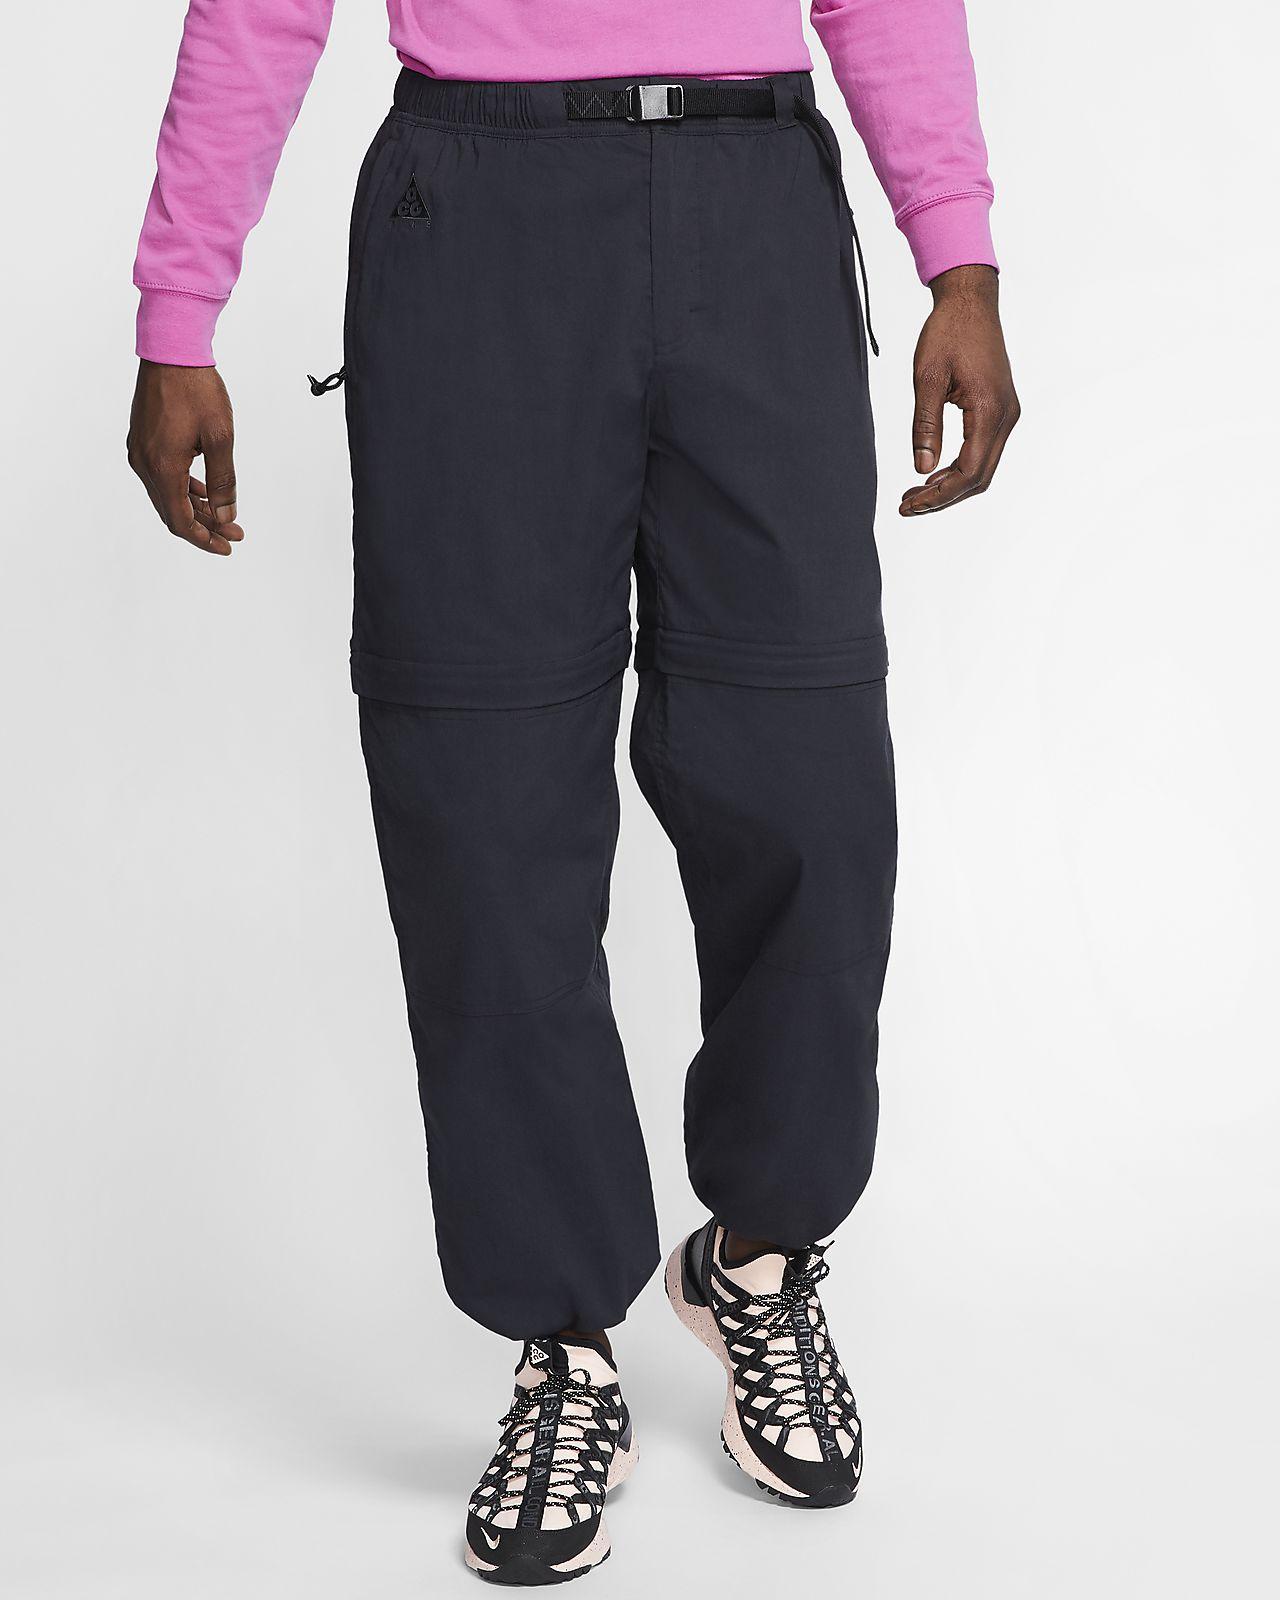 Nike ACG Men's Convertible Pants